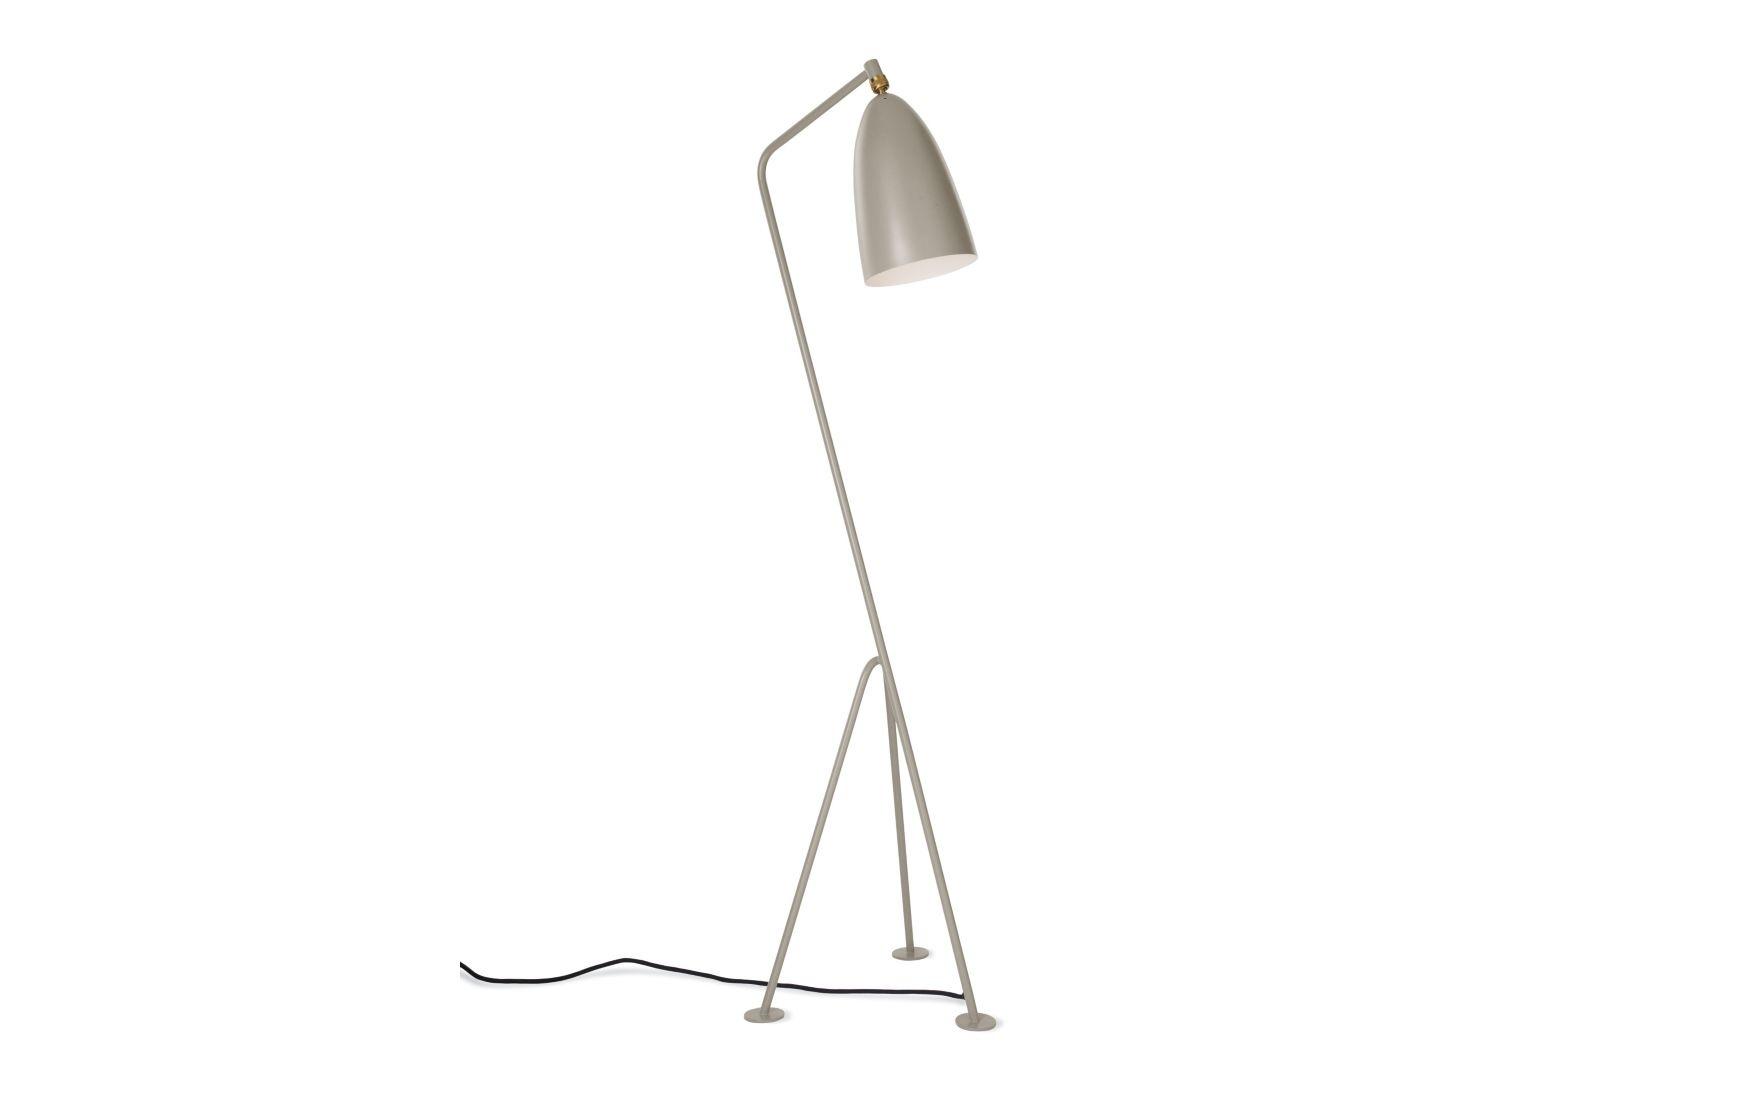 Gubi Grashoppa Floor Lamp, US